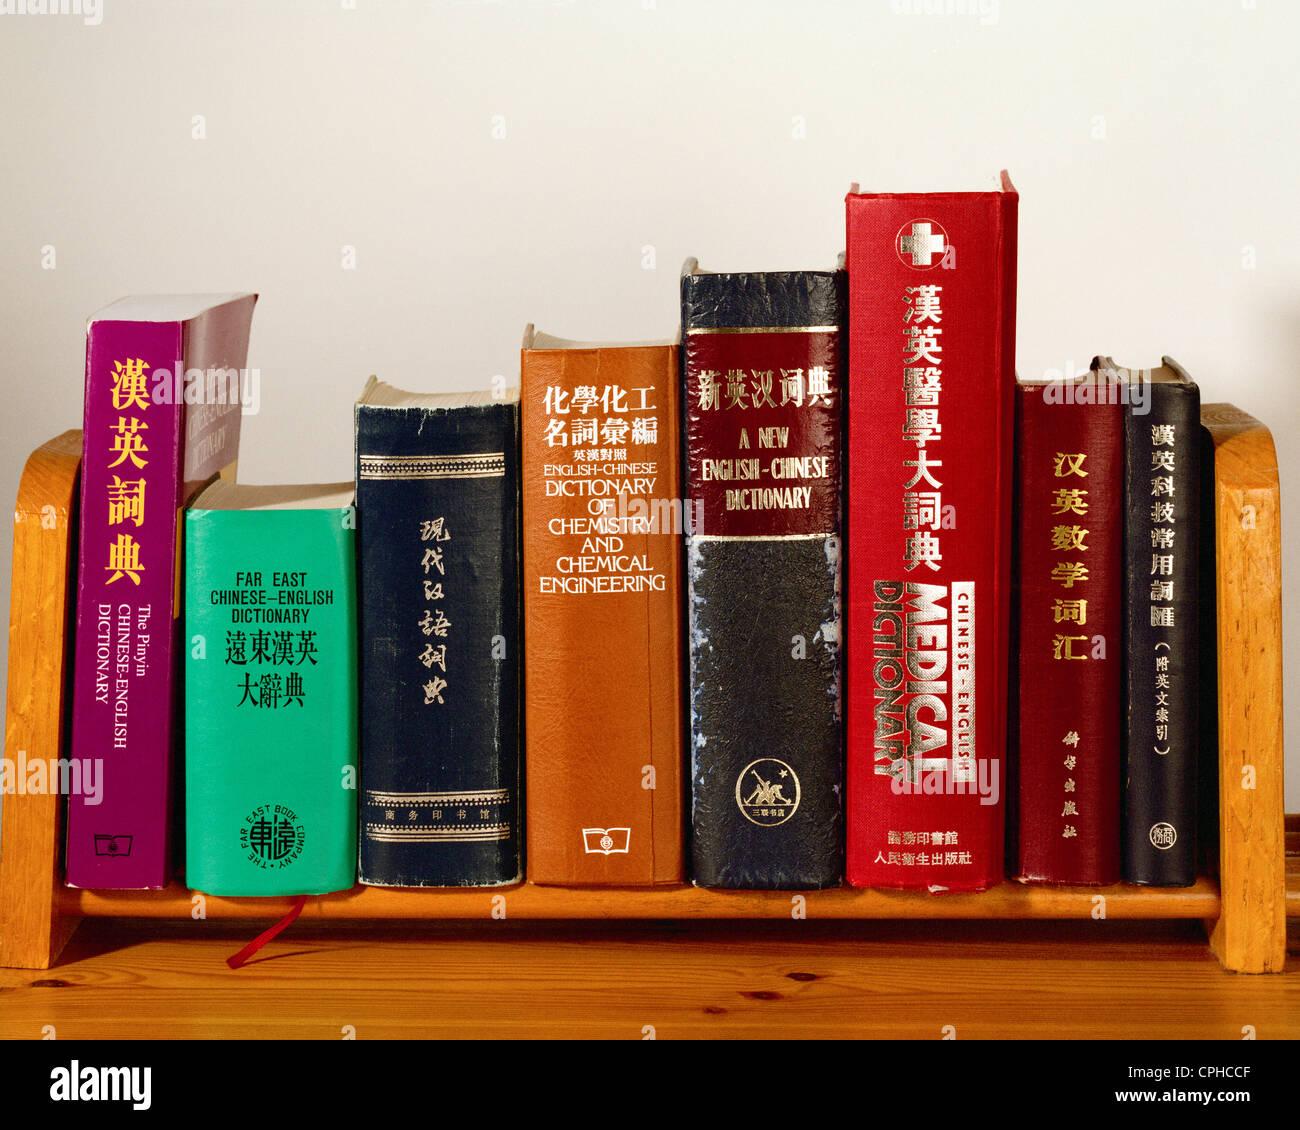 Row of Chinese language dictionaries on bookshelf Stock